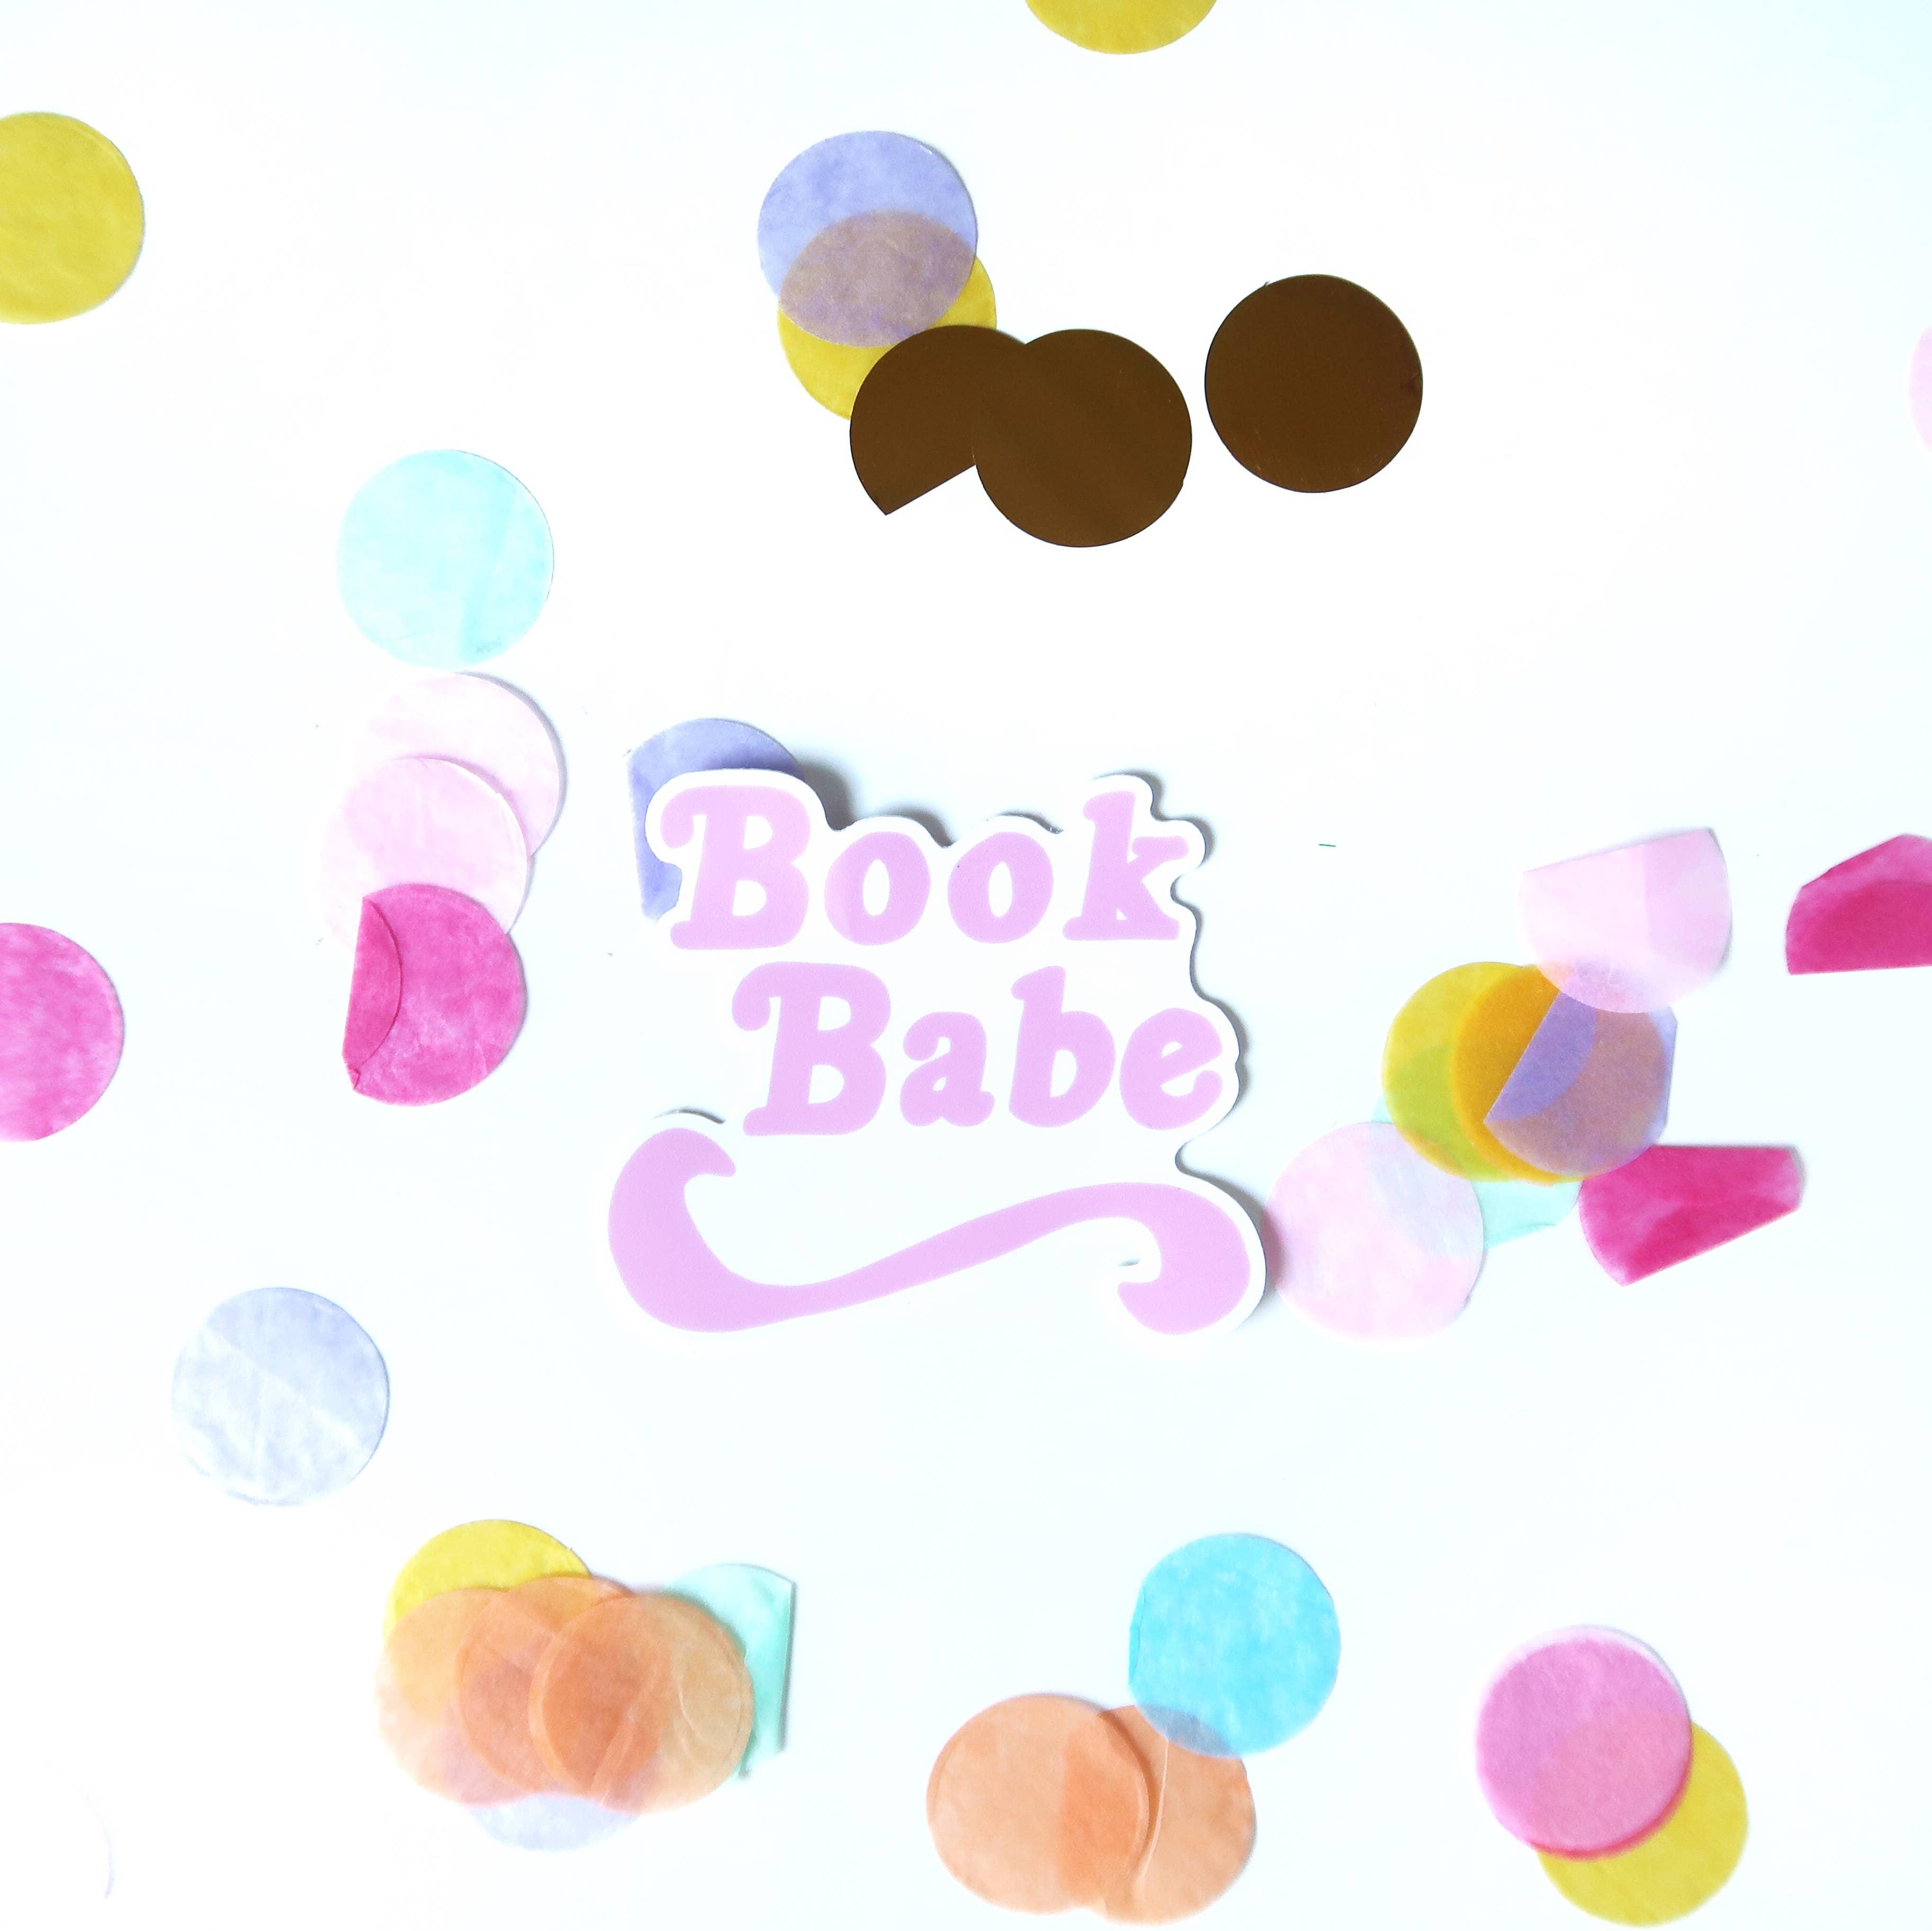 Book Babe Sticker   Trada Marketplace